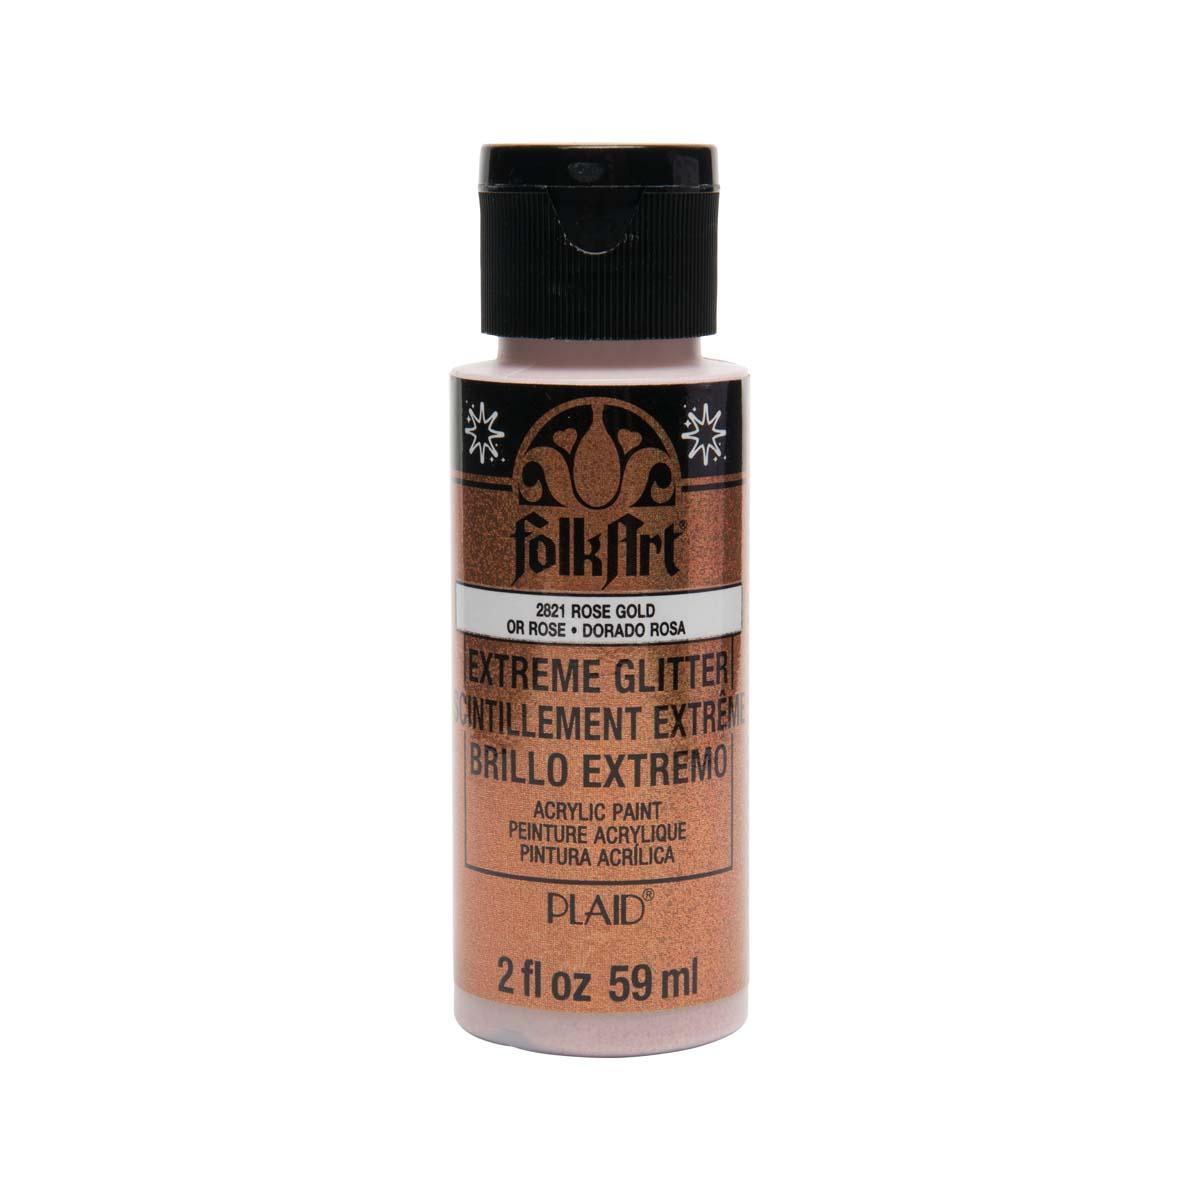 FolkArt ® Extreme Glitter™ - Rose Gold, 2 oz. - 2821